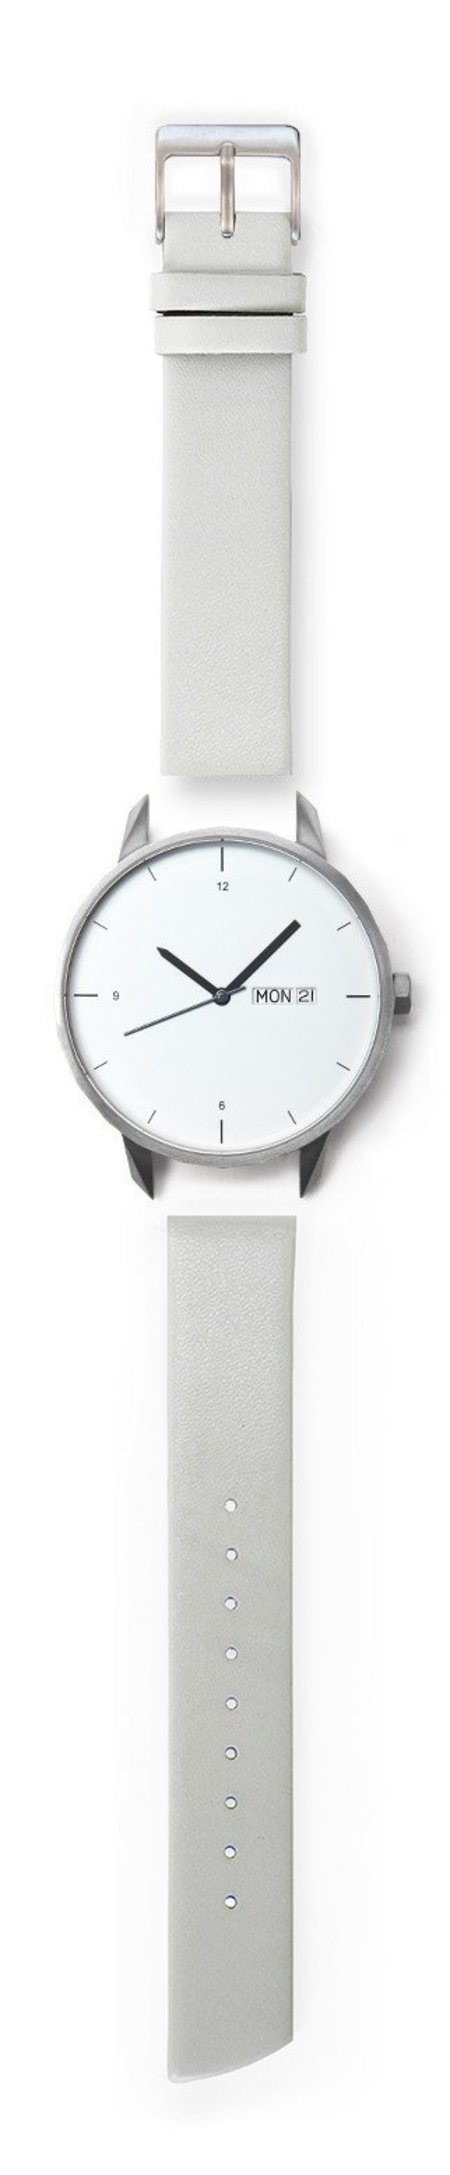 Unisex Tinker Watches 42mm Silver Watch Grey Strap